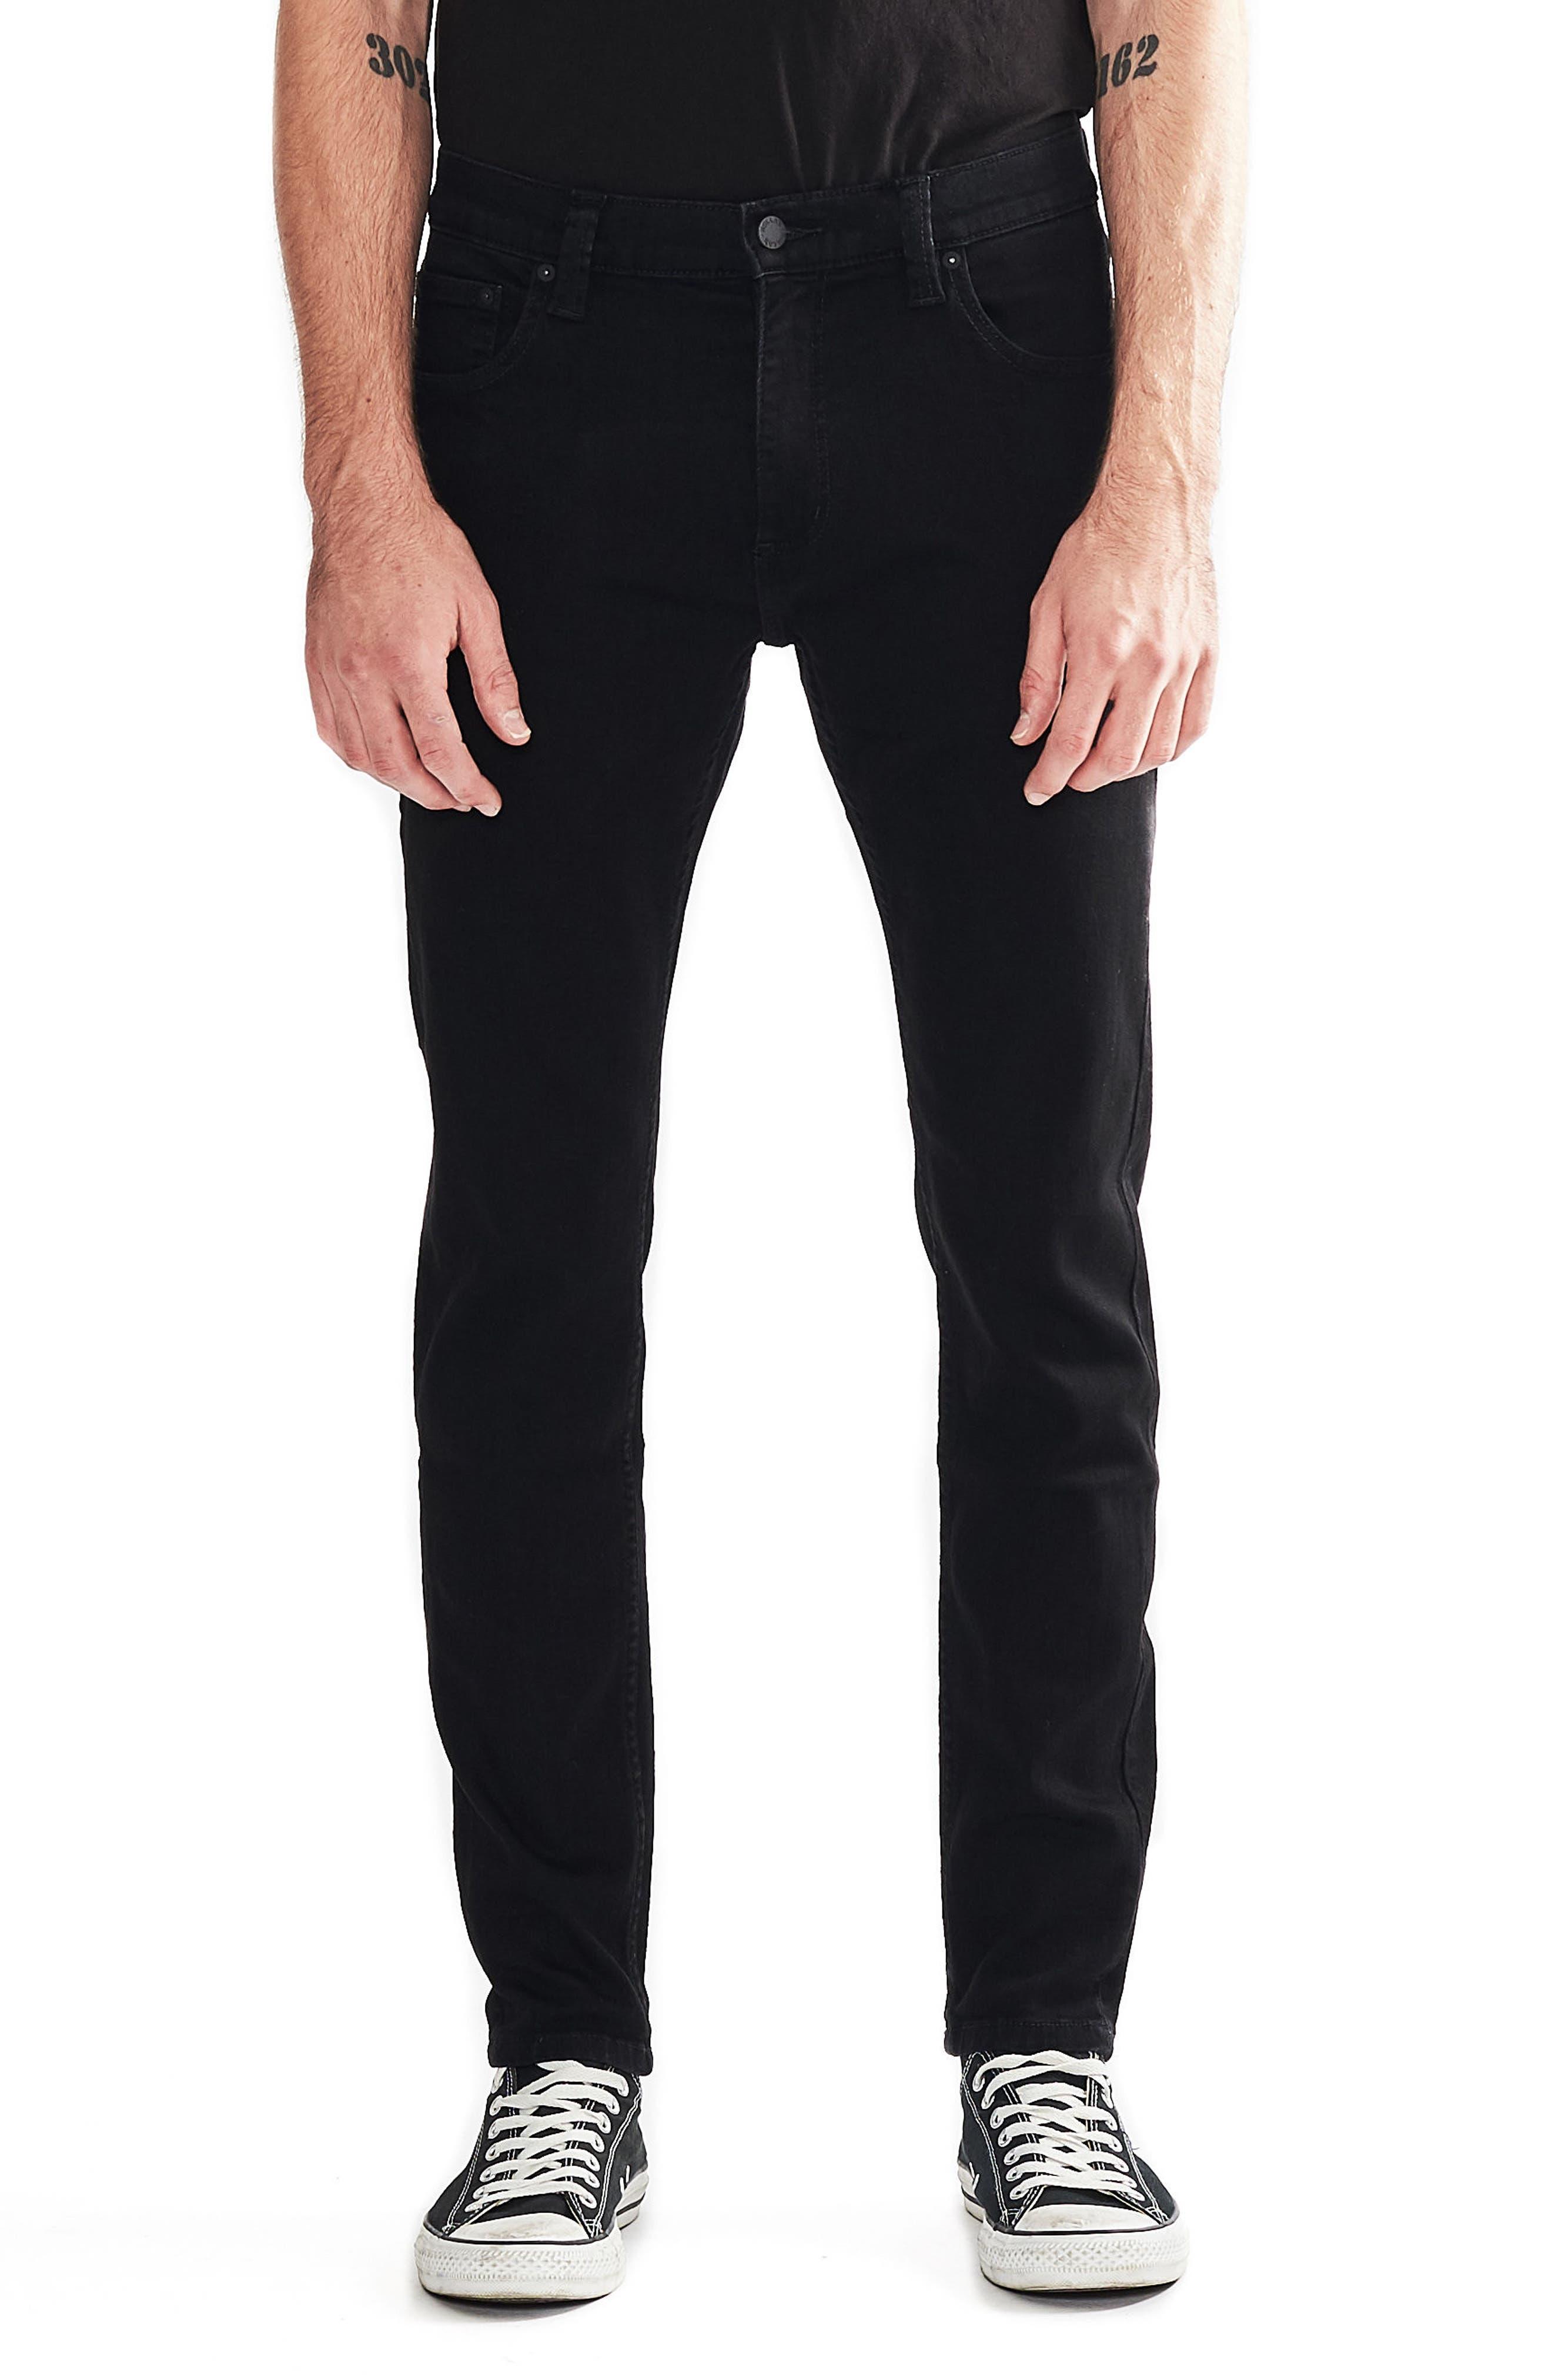 Stinger Skinny Fit Jeans,                             Main thumbnail 1, color,                             Black Gold